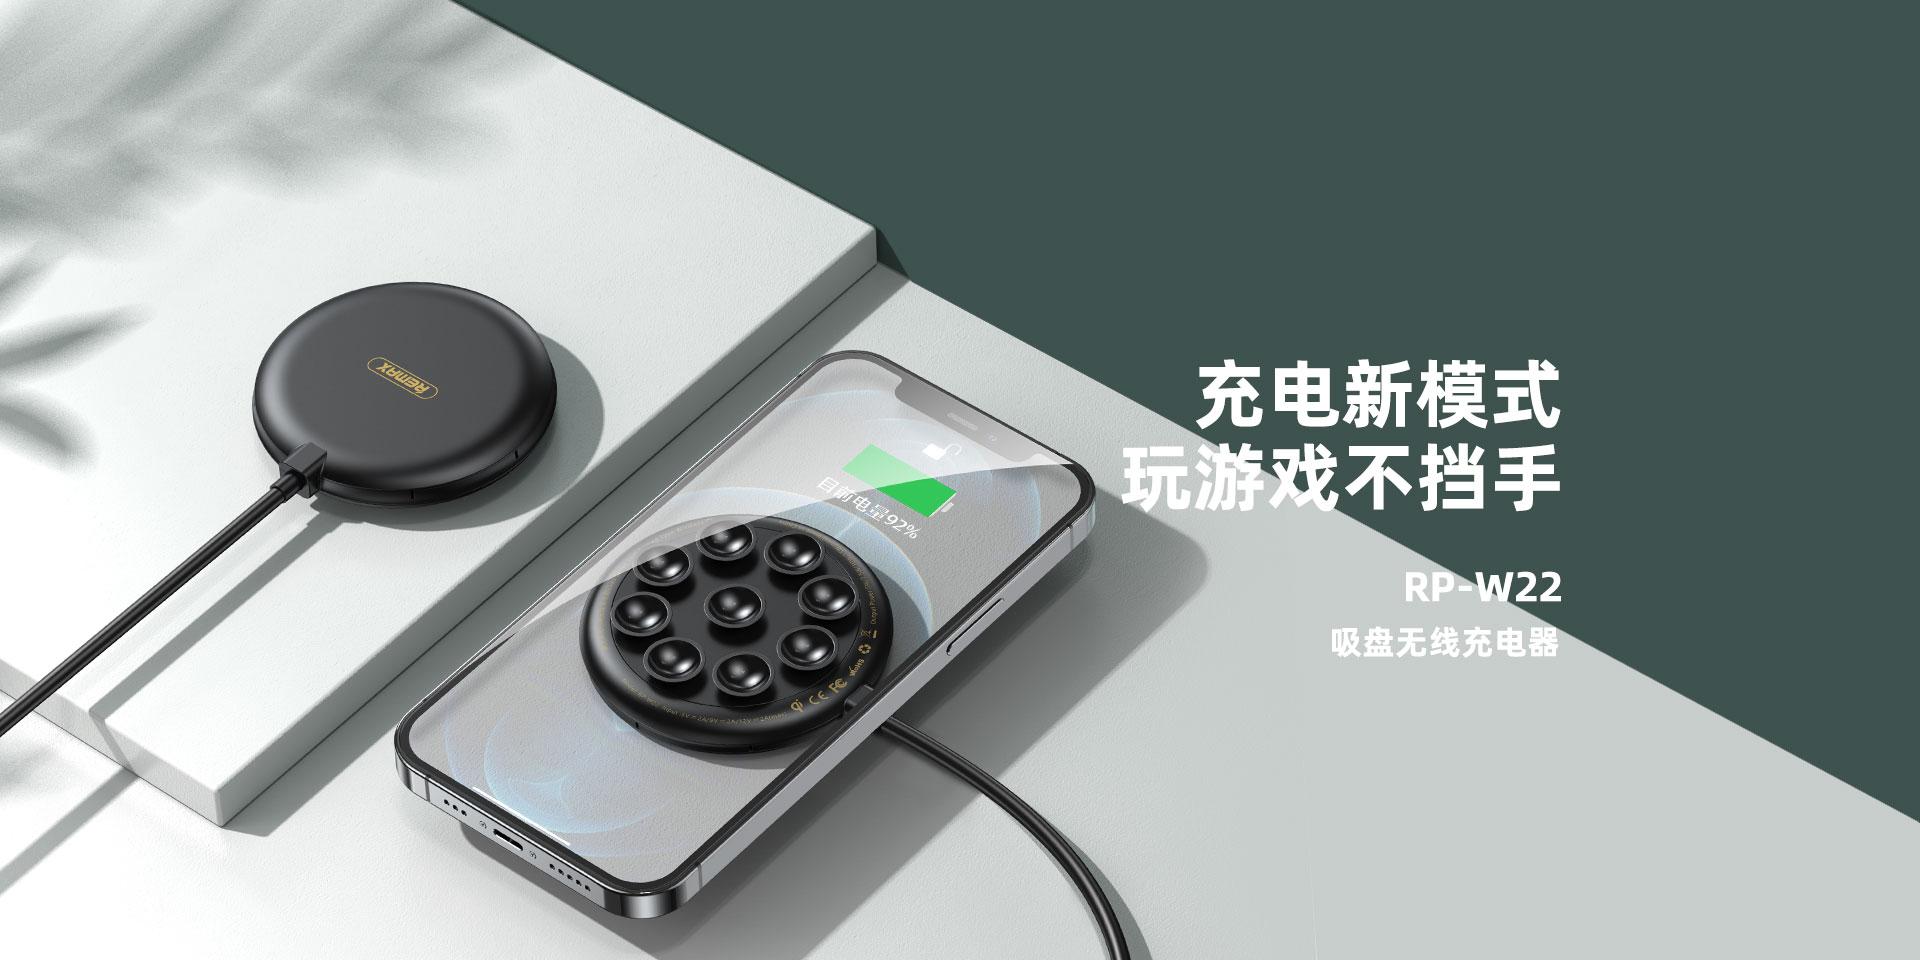 20201229043430395